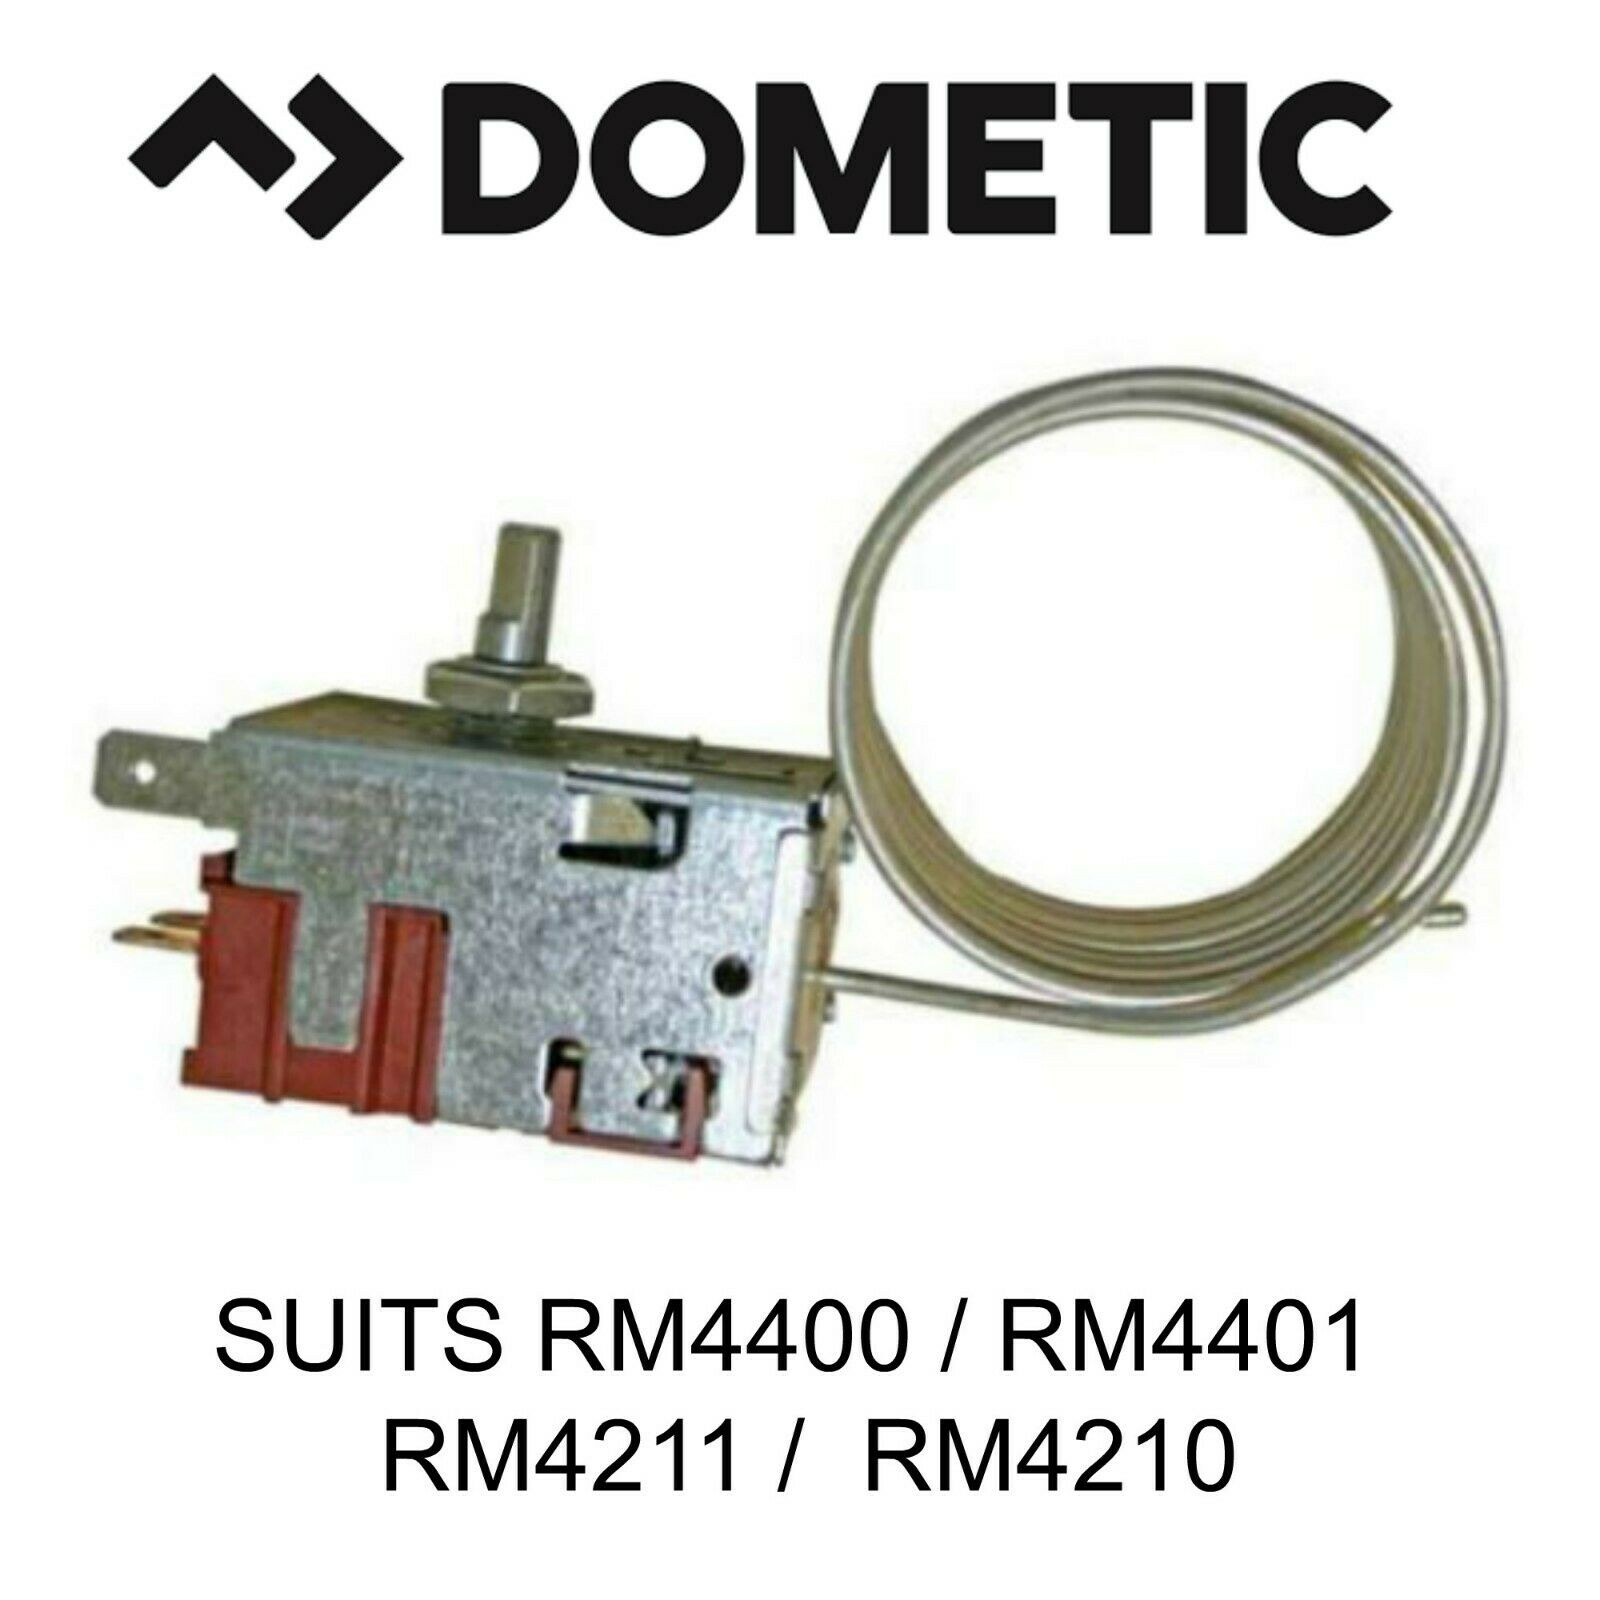 DOMETIC 2926528106 ELECTRIC THERMOSTAT 240V CARAVAN